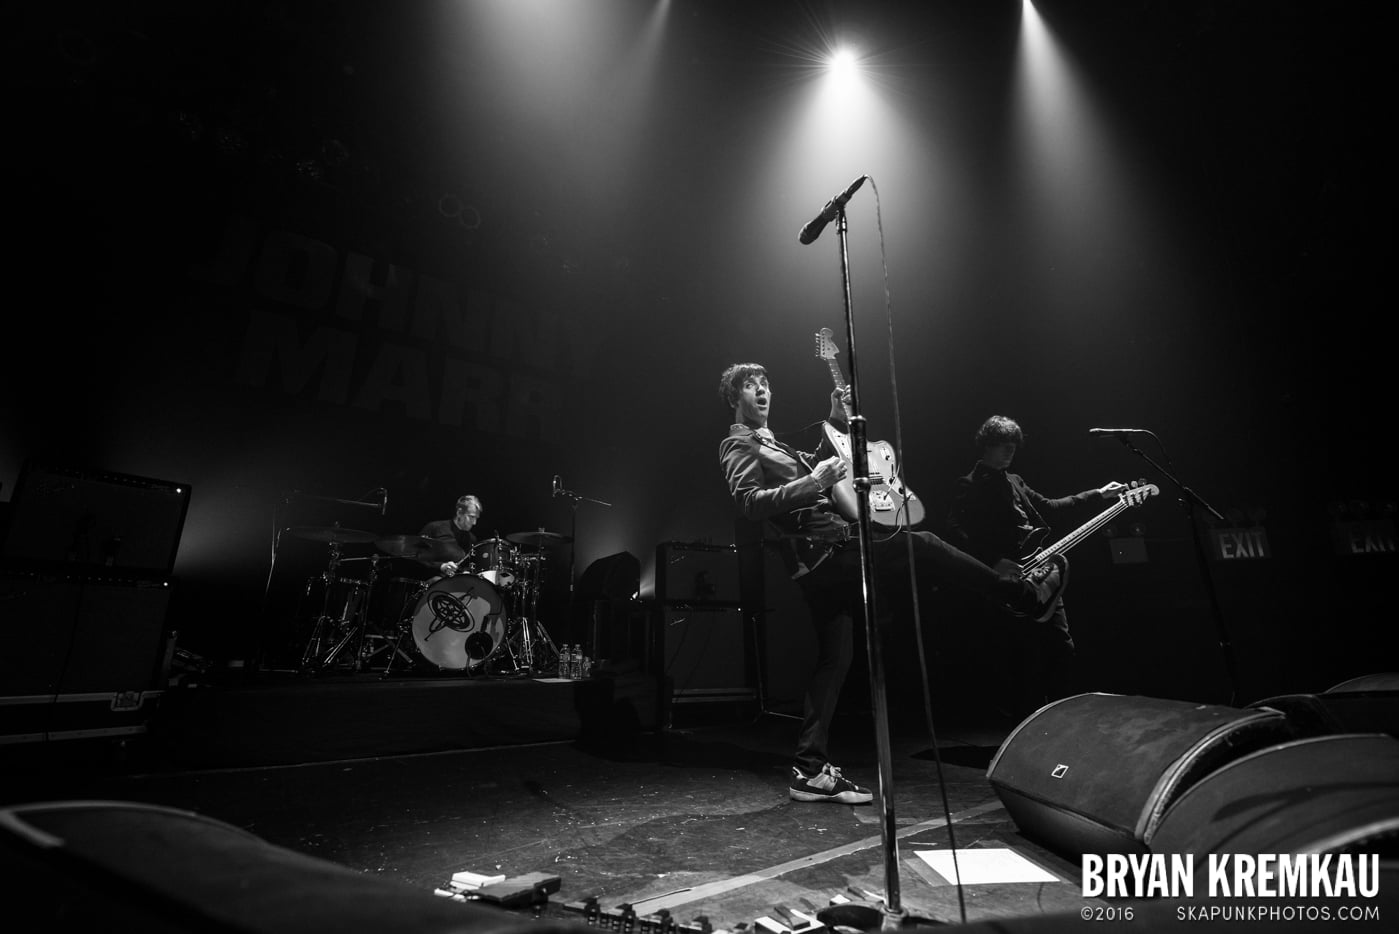 Johnny Marr @ Gramercy Theatre, NYC - 11.12.14 (2)